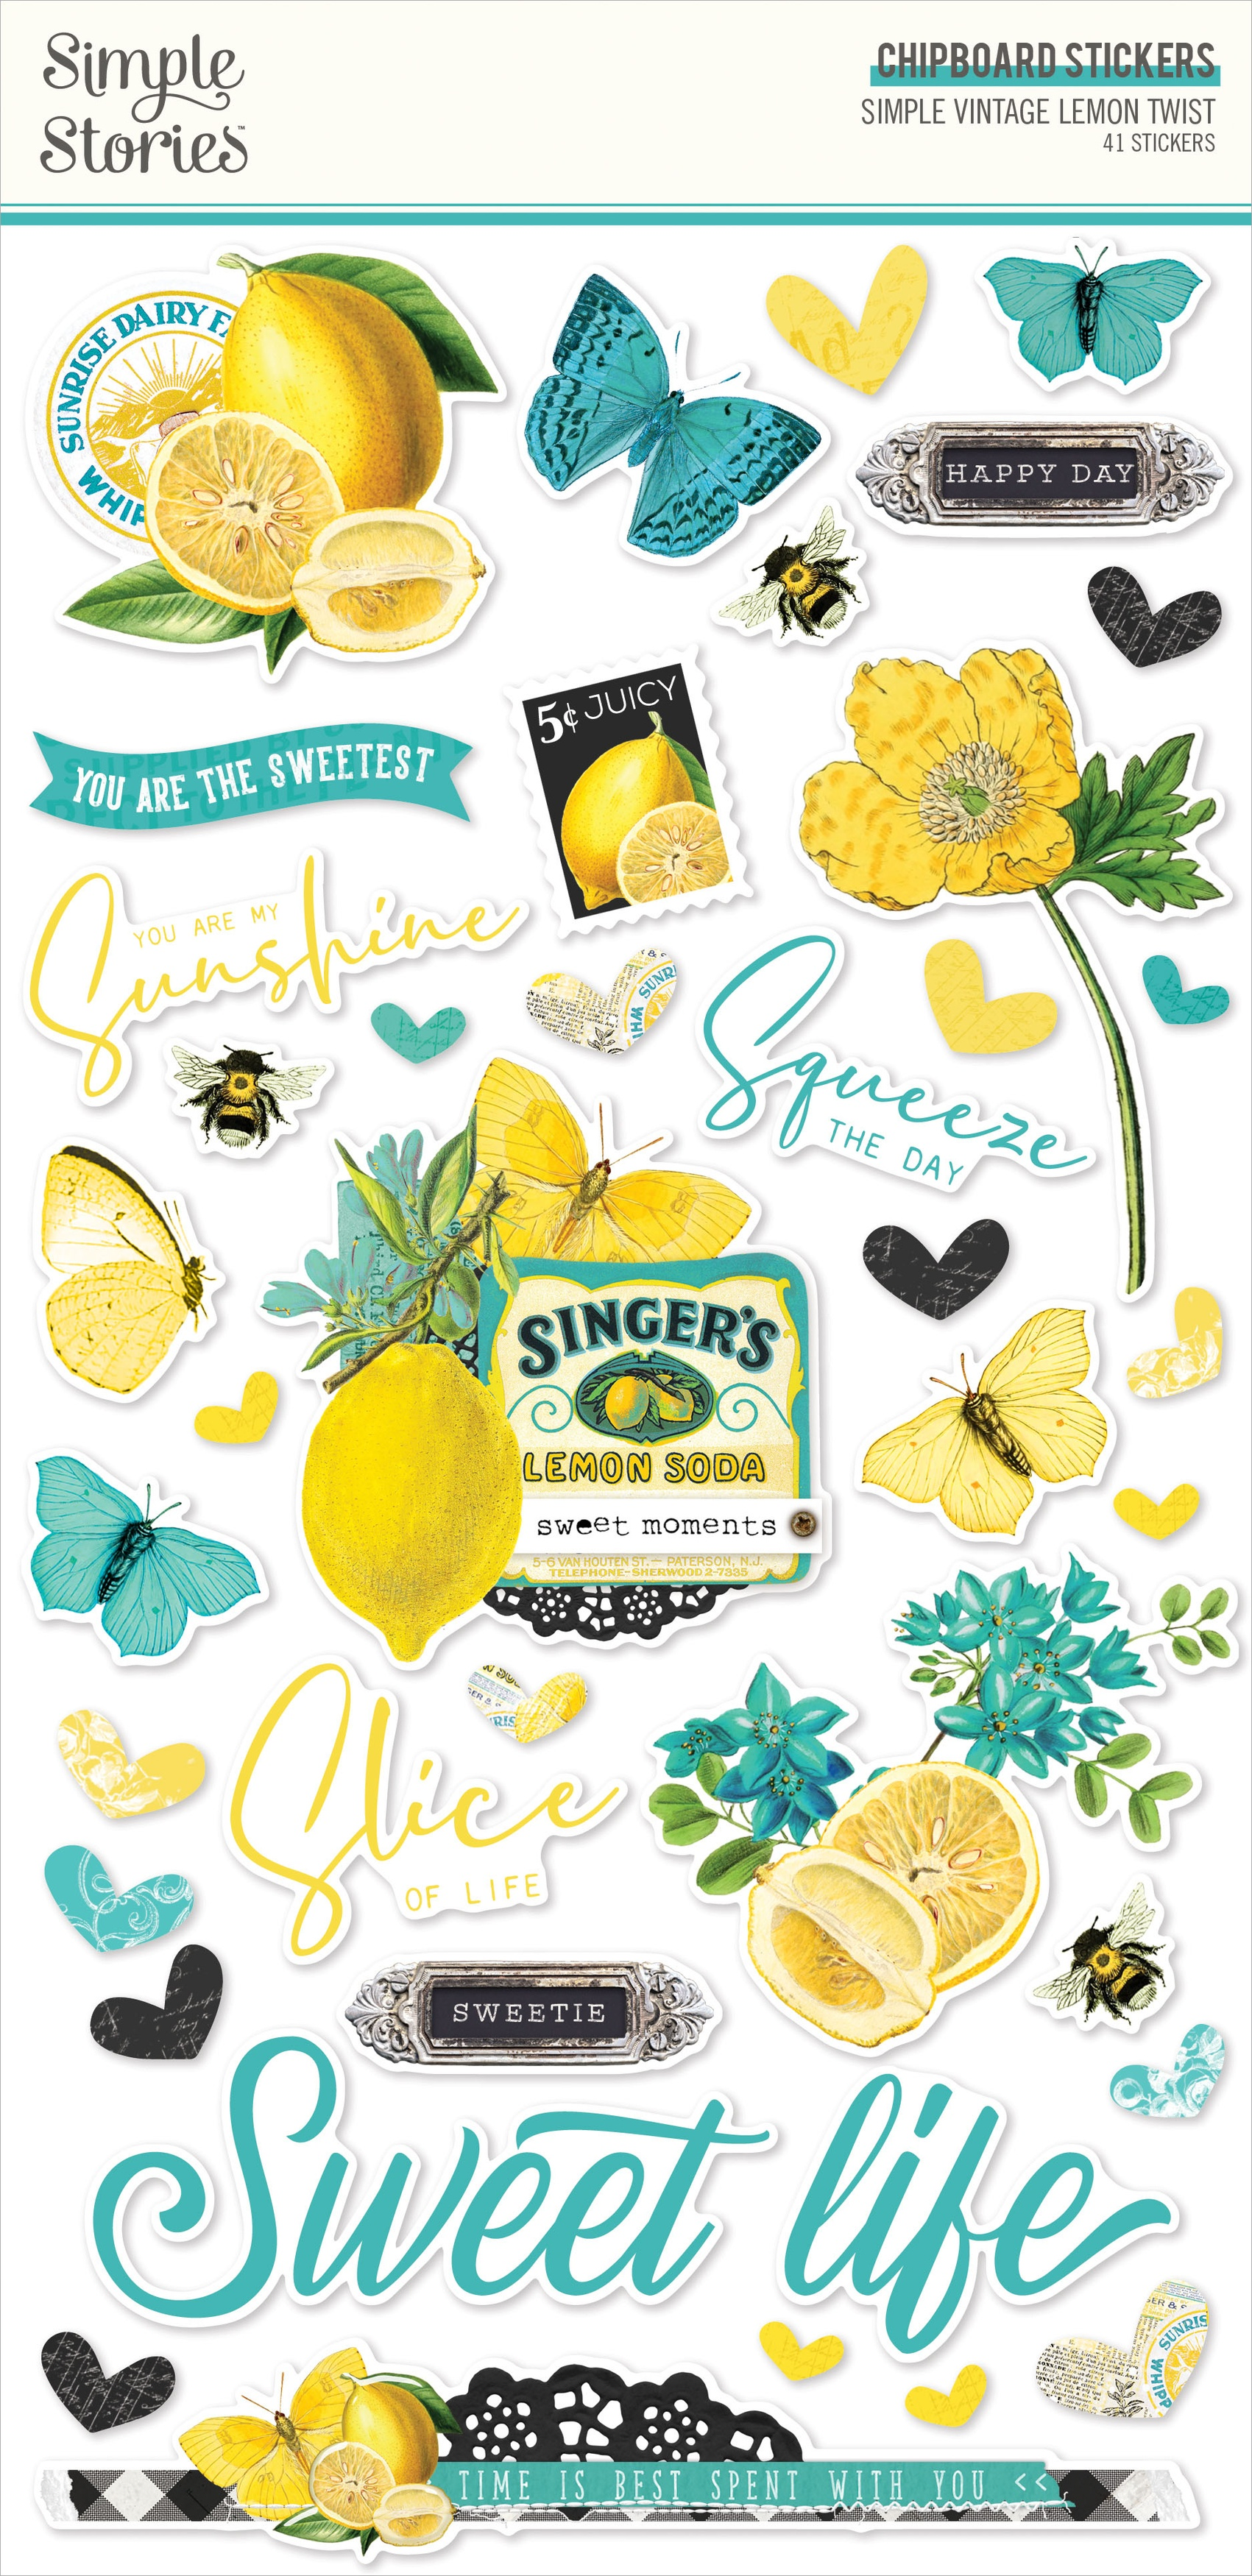 Simple Vintage Lemon Twist Chipboard Stickers 6X12-